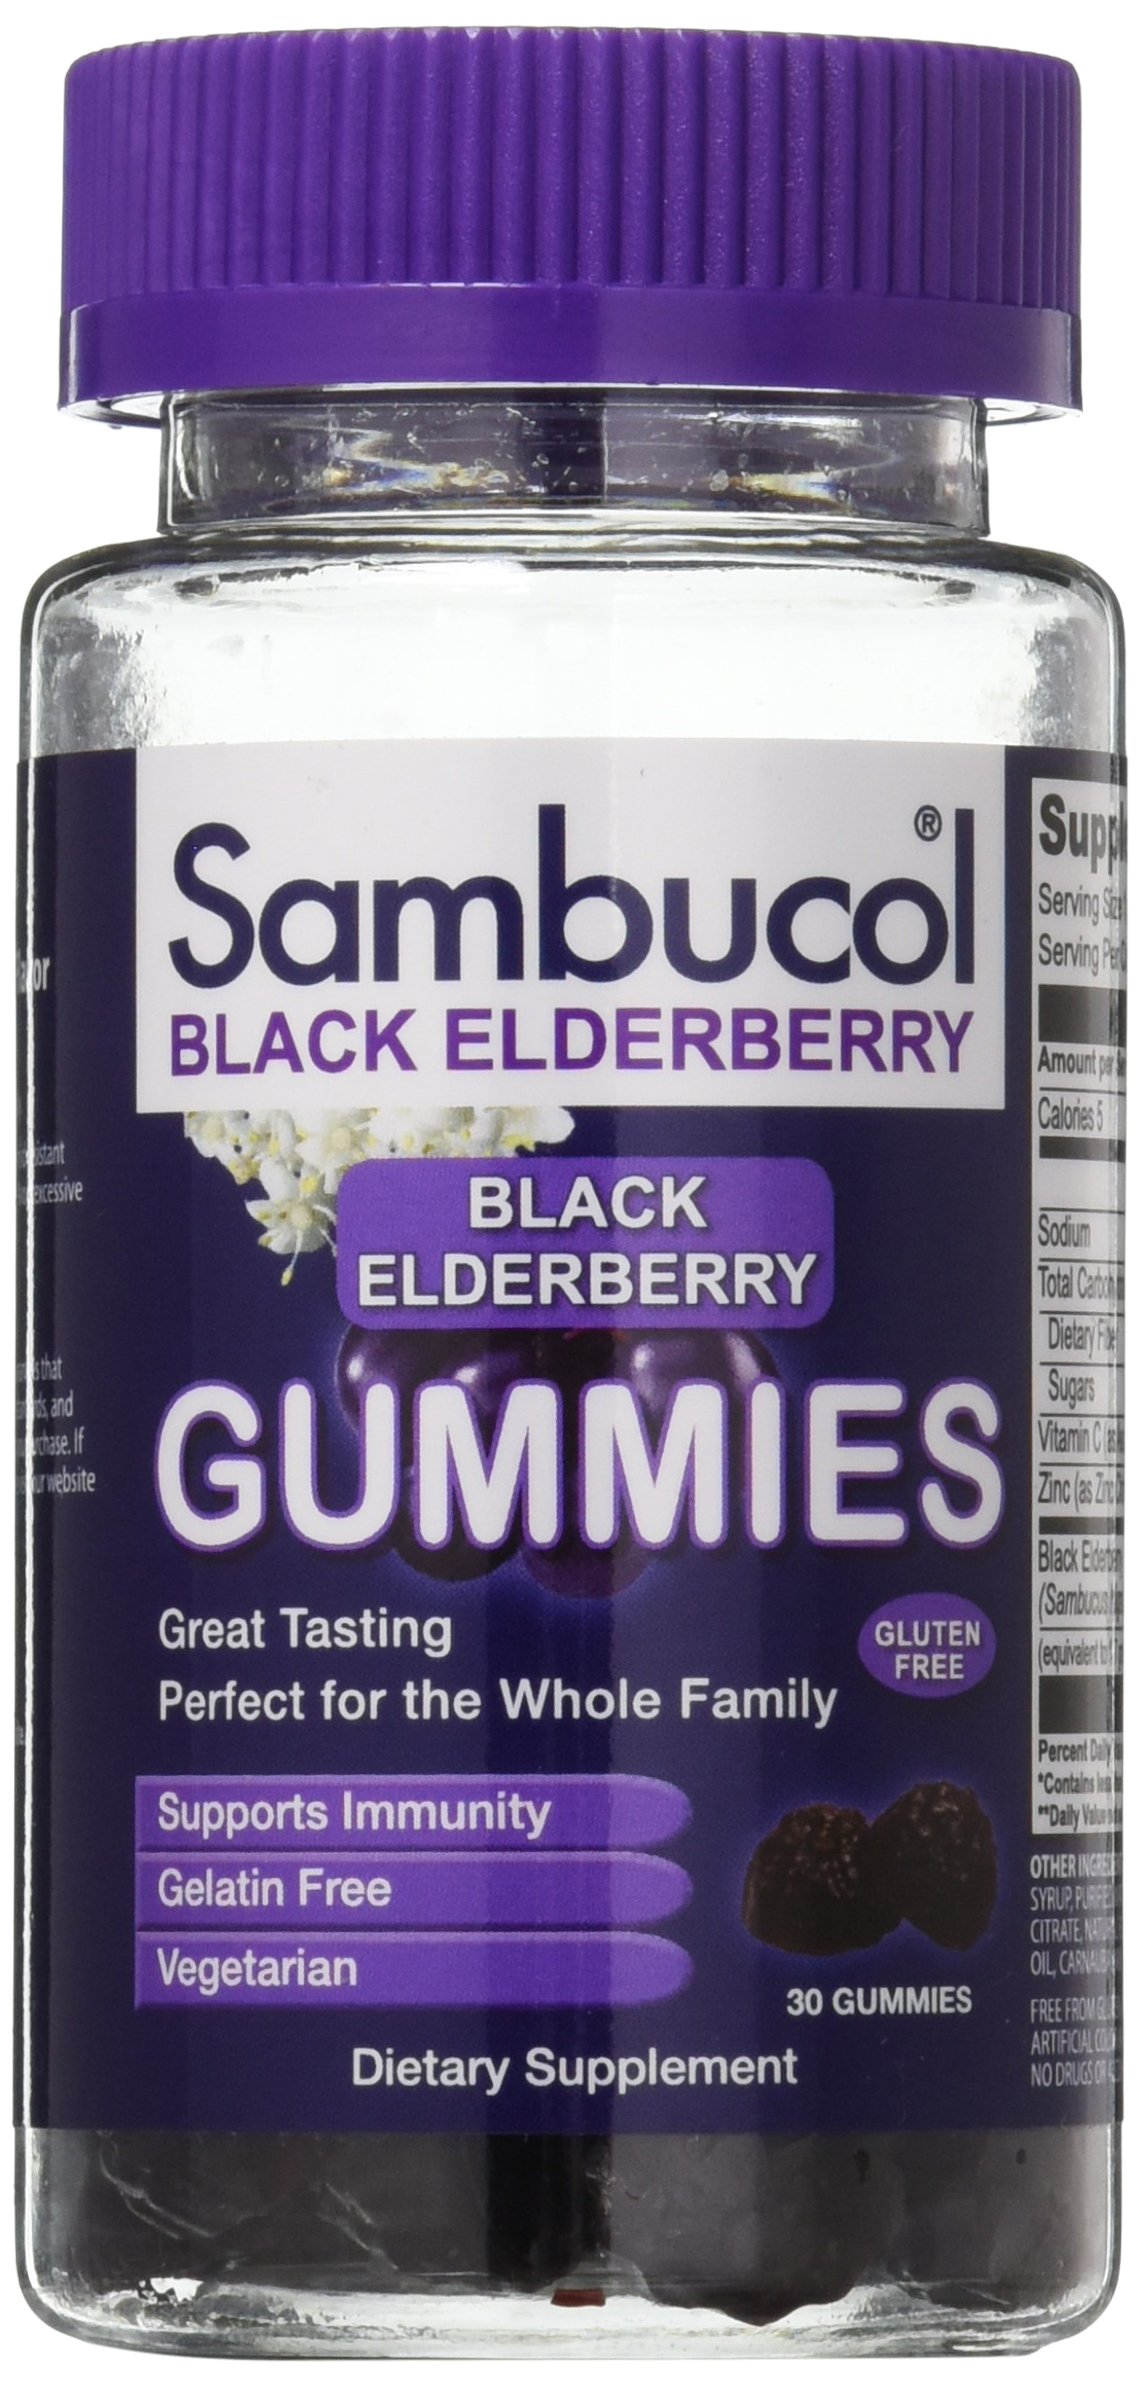 Sambucol Black Elderberry Gummies